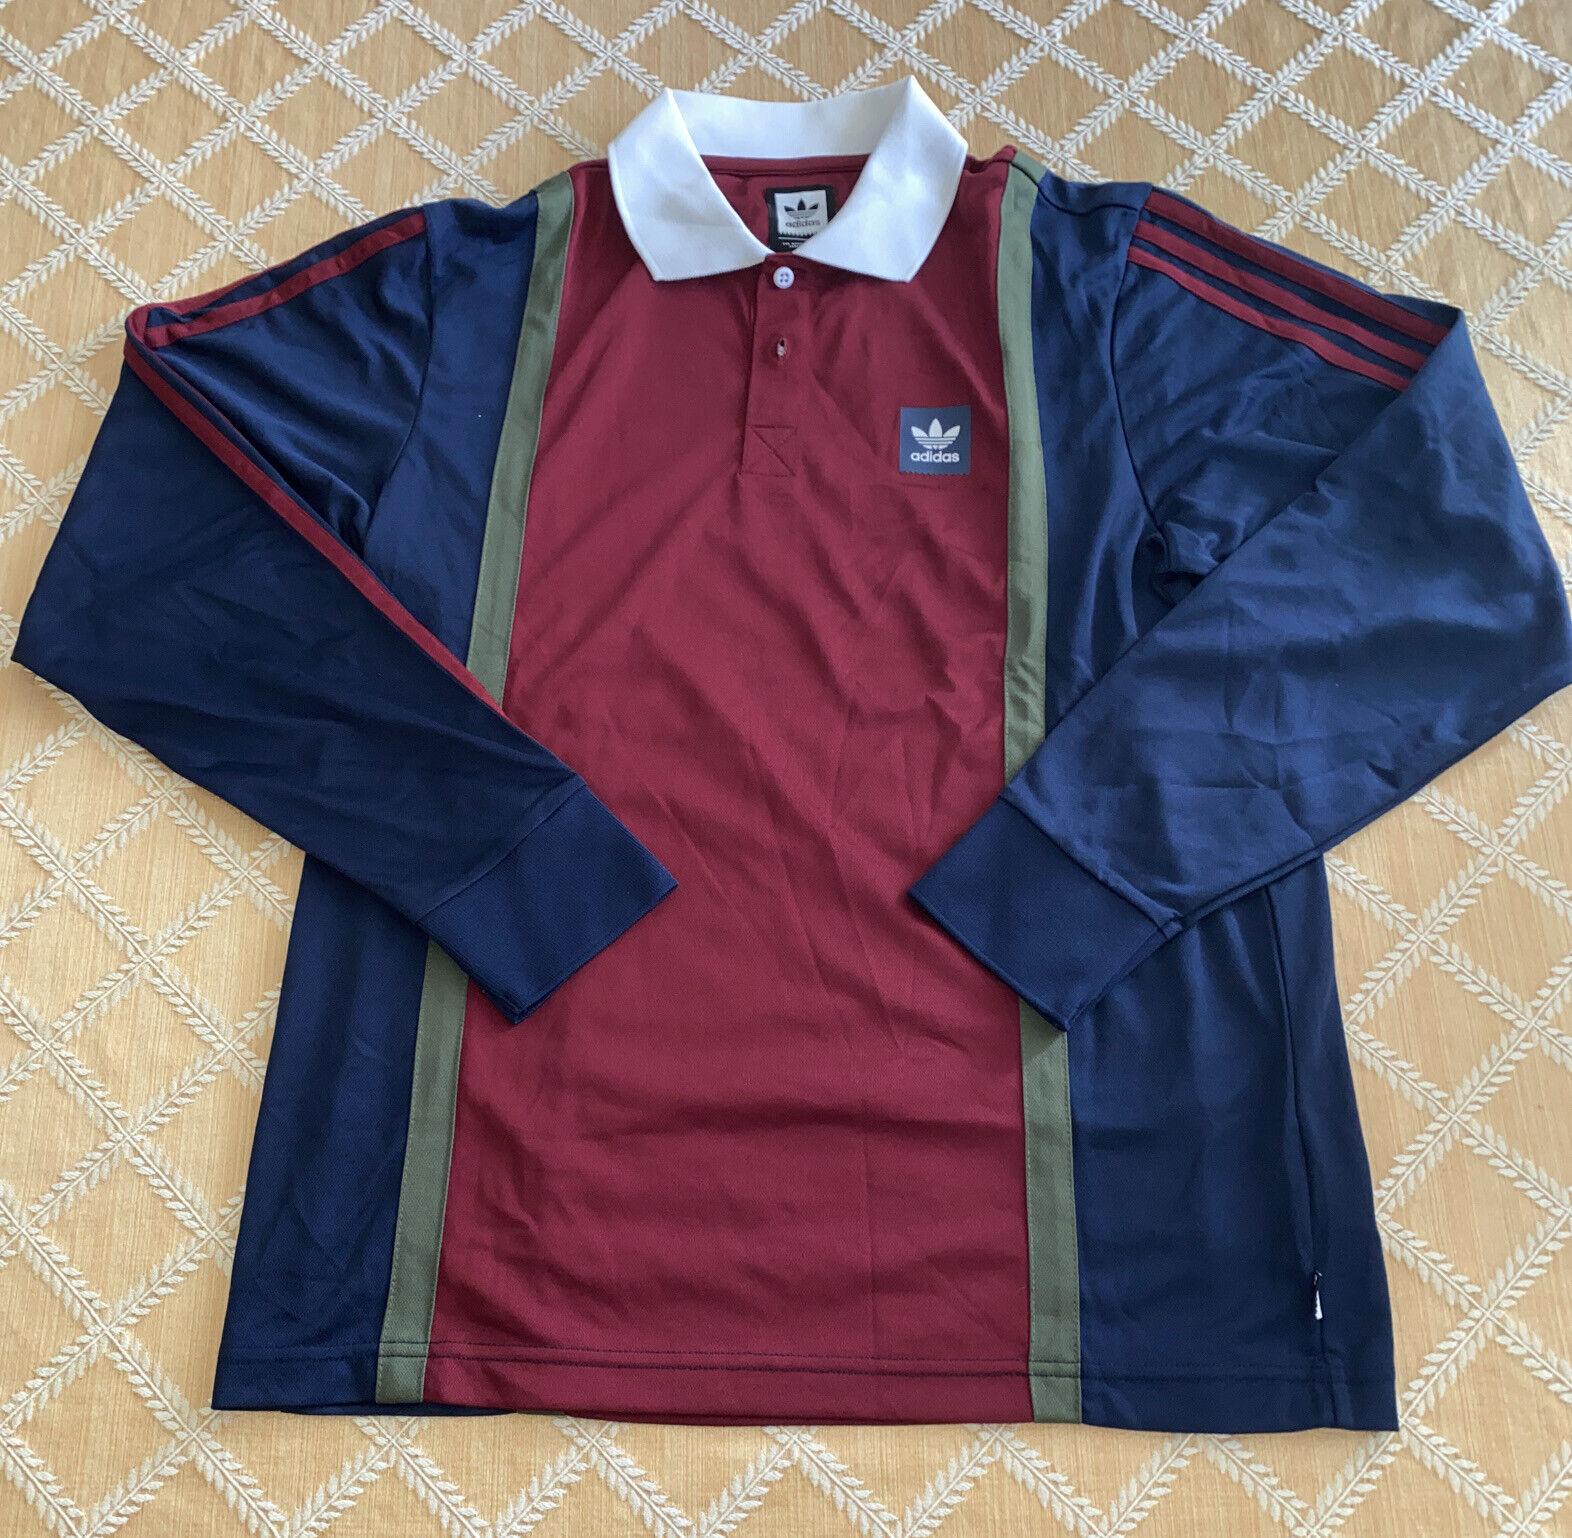 adidas Originals Skateboarding Rugby Jersey Shirt DH6643 Size XL ...